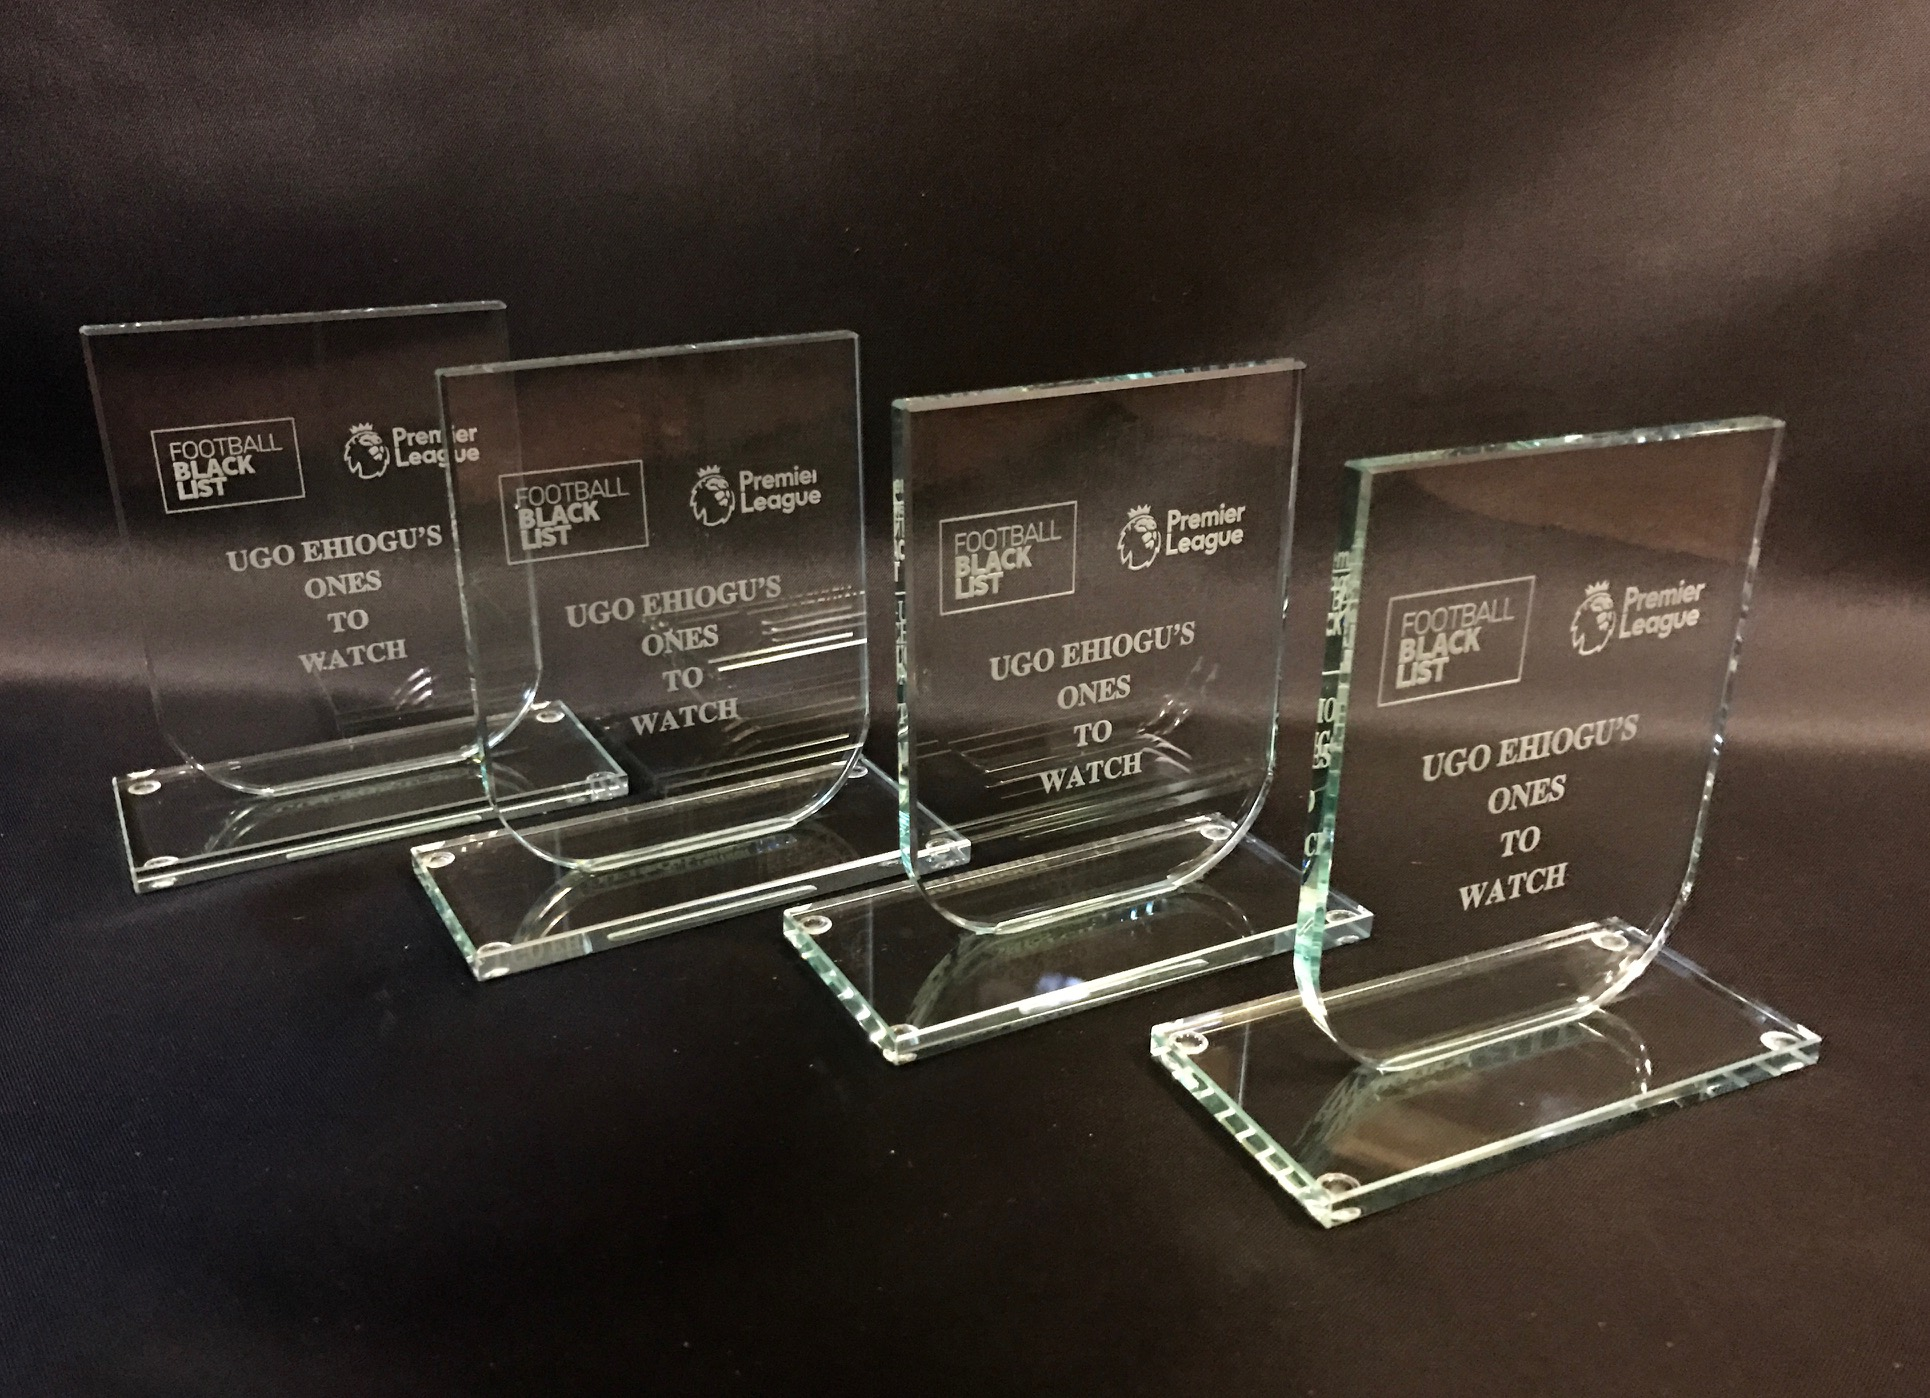 14. Football Blacklist Glass Award 1